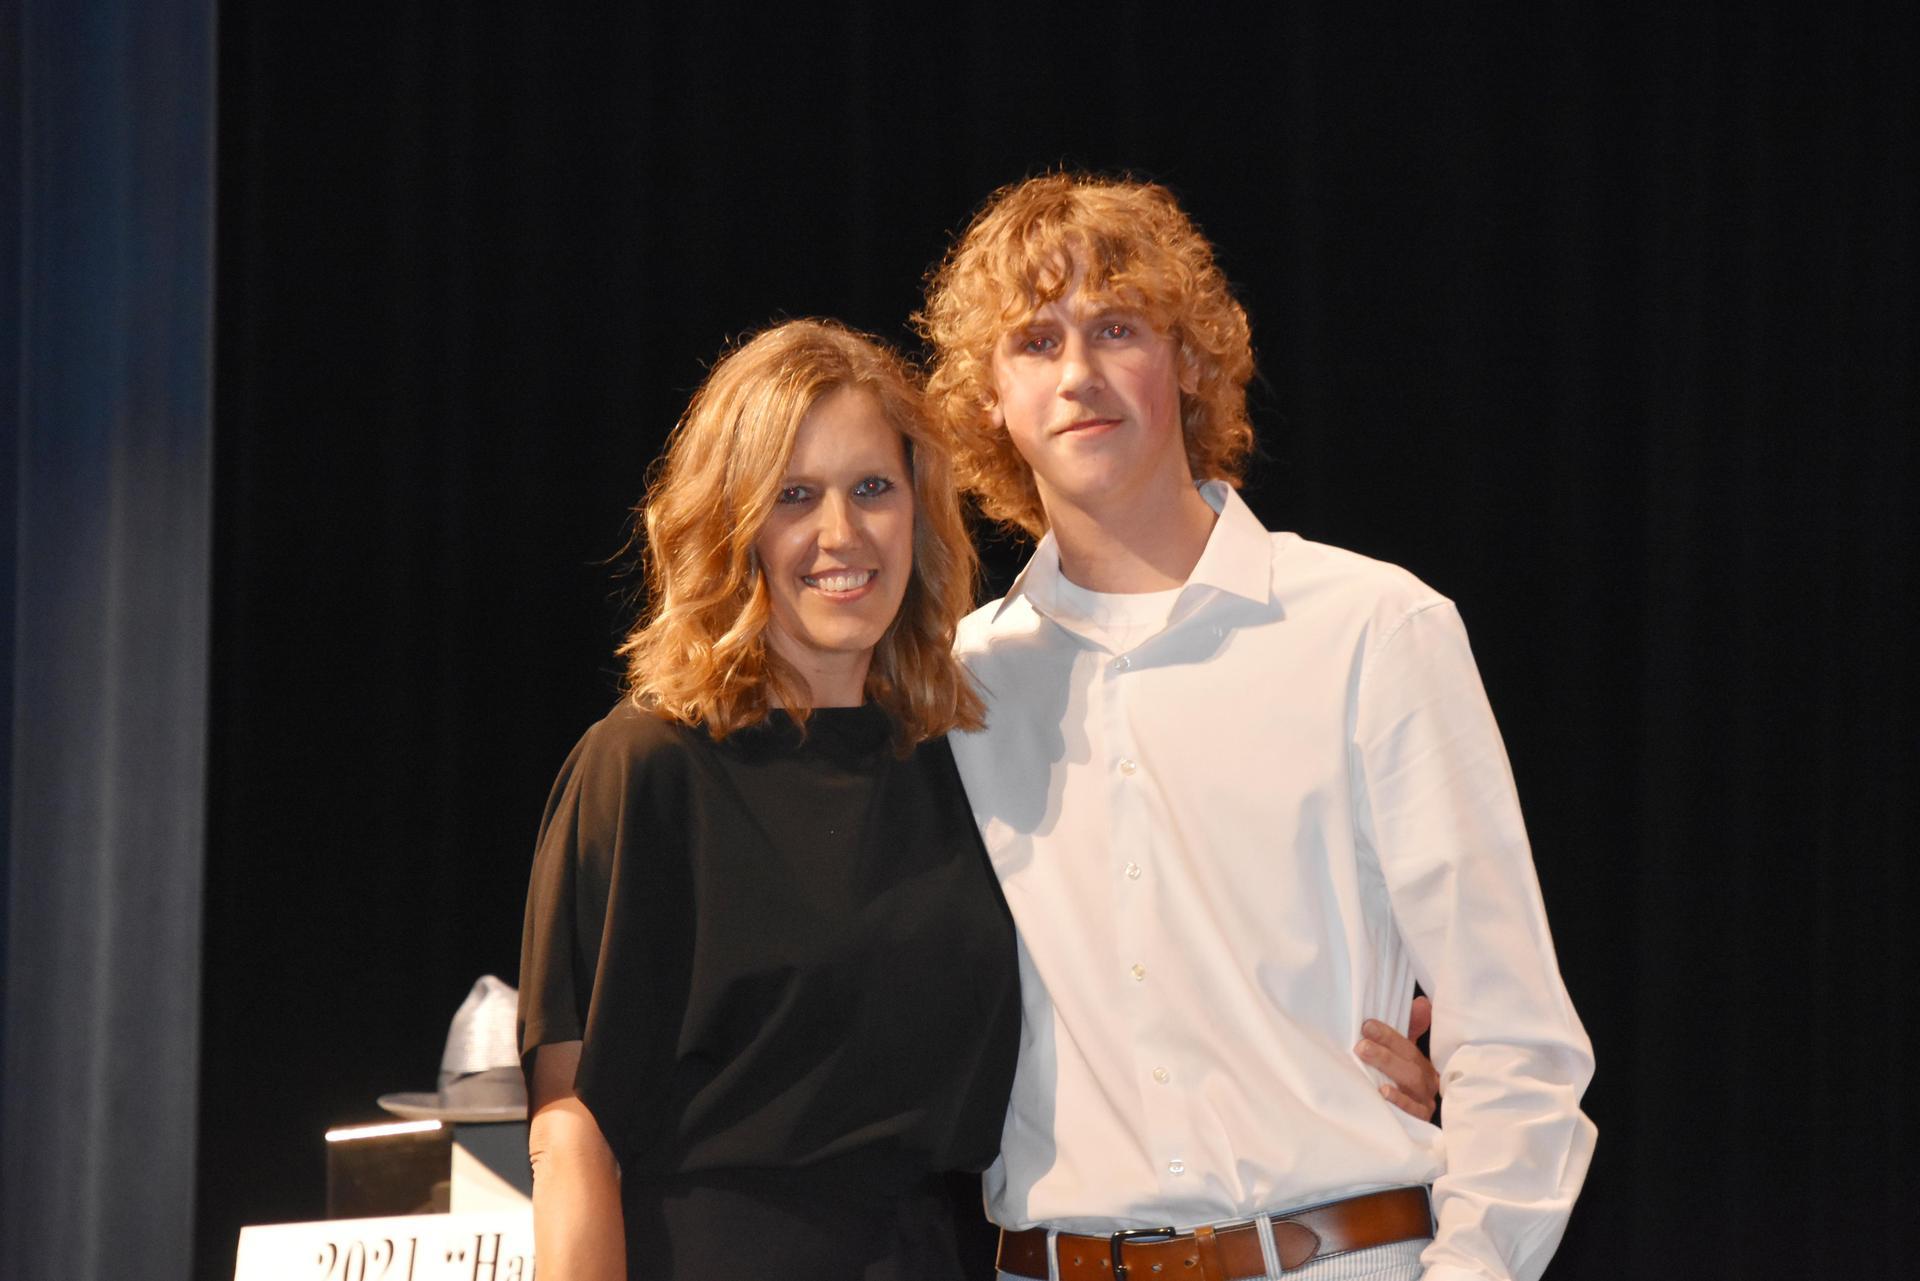 Luke Bagg and Kristy Williams